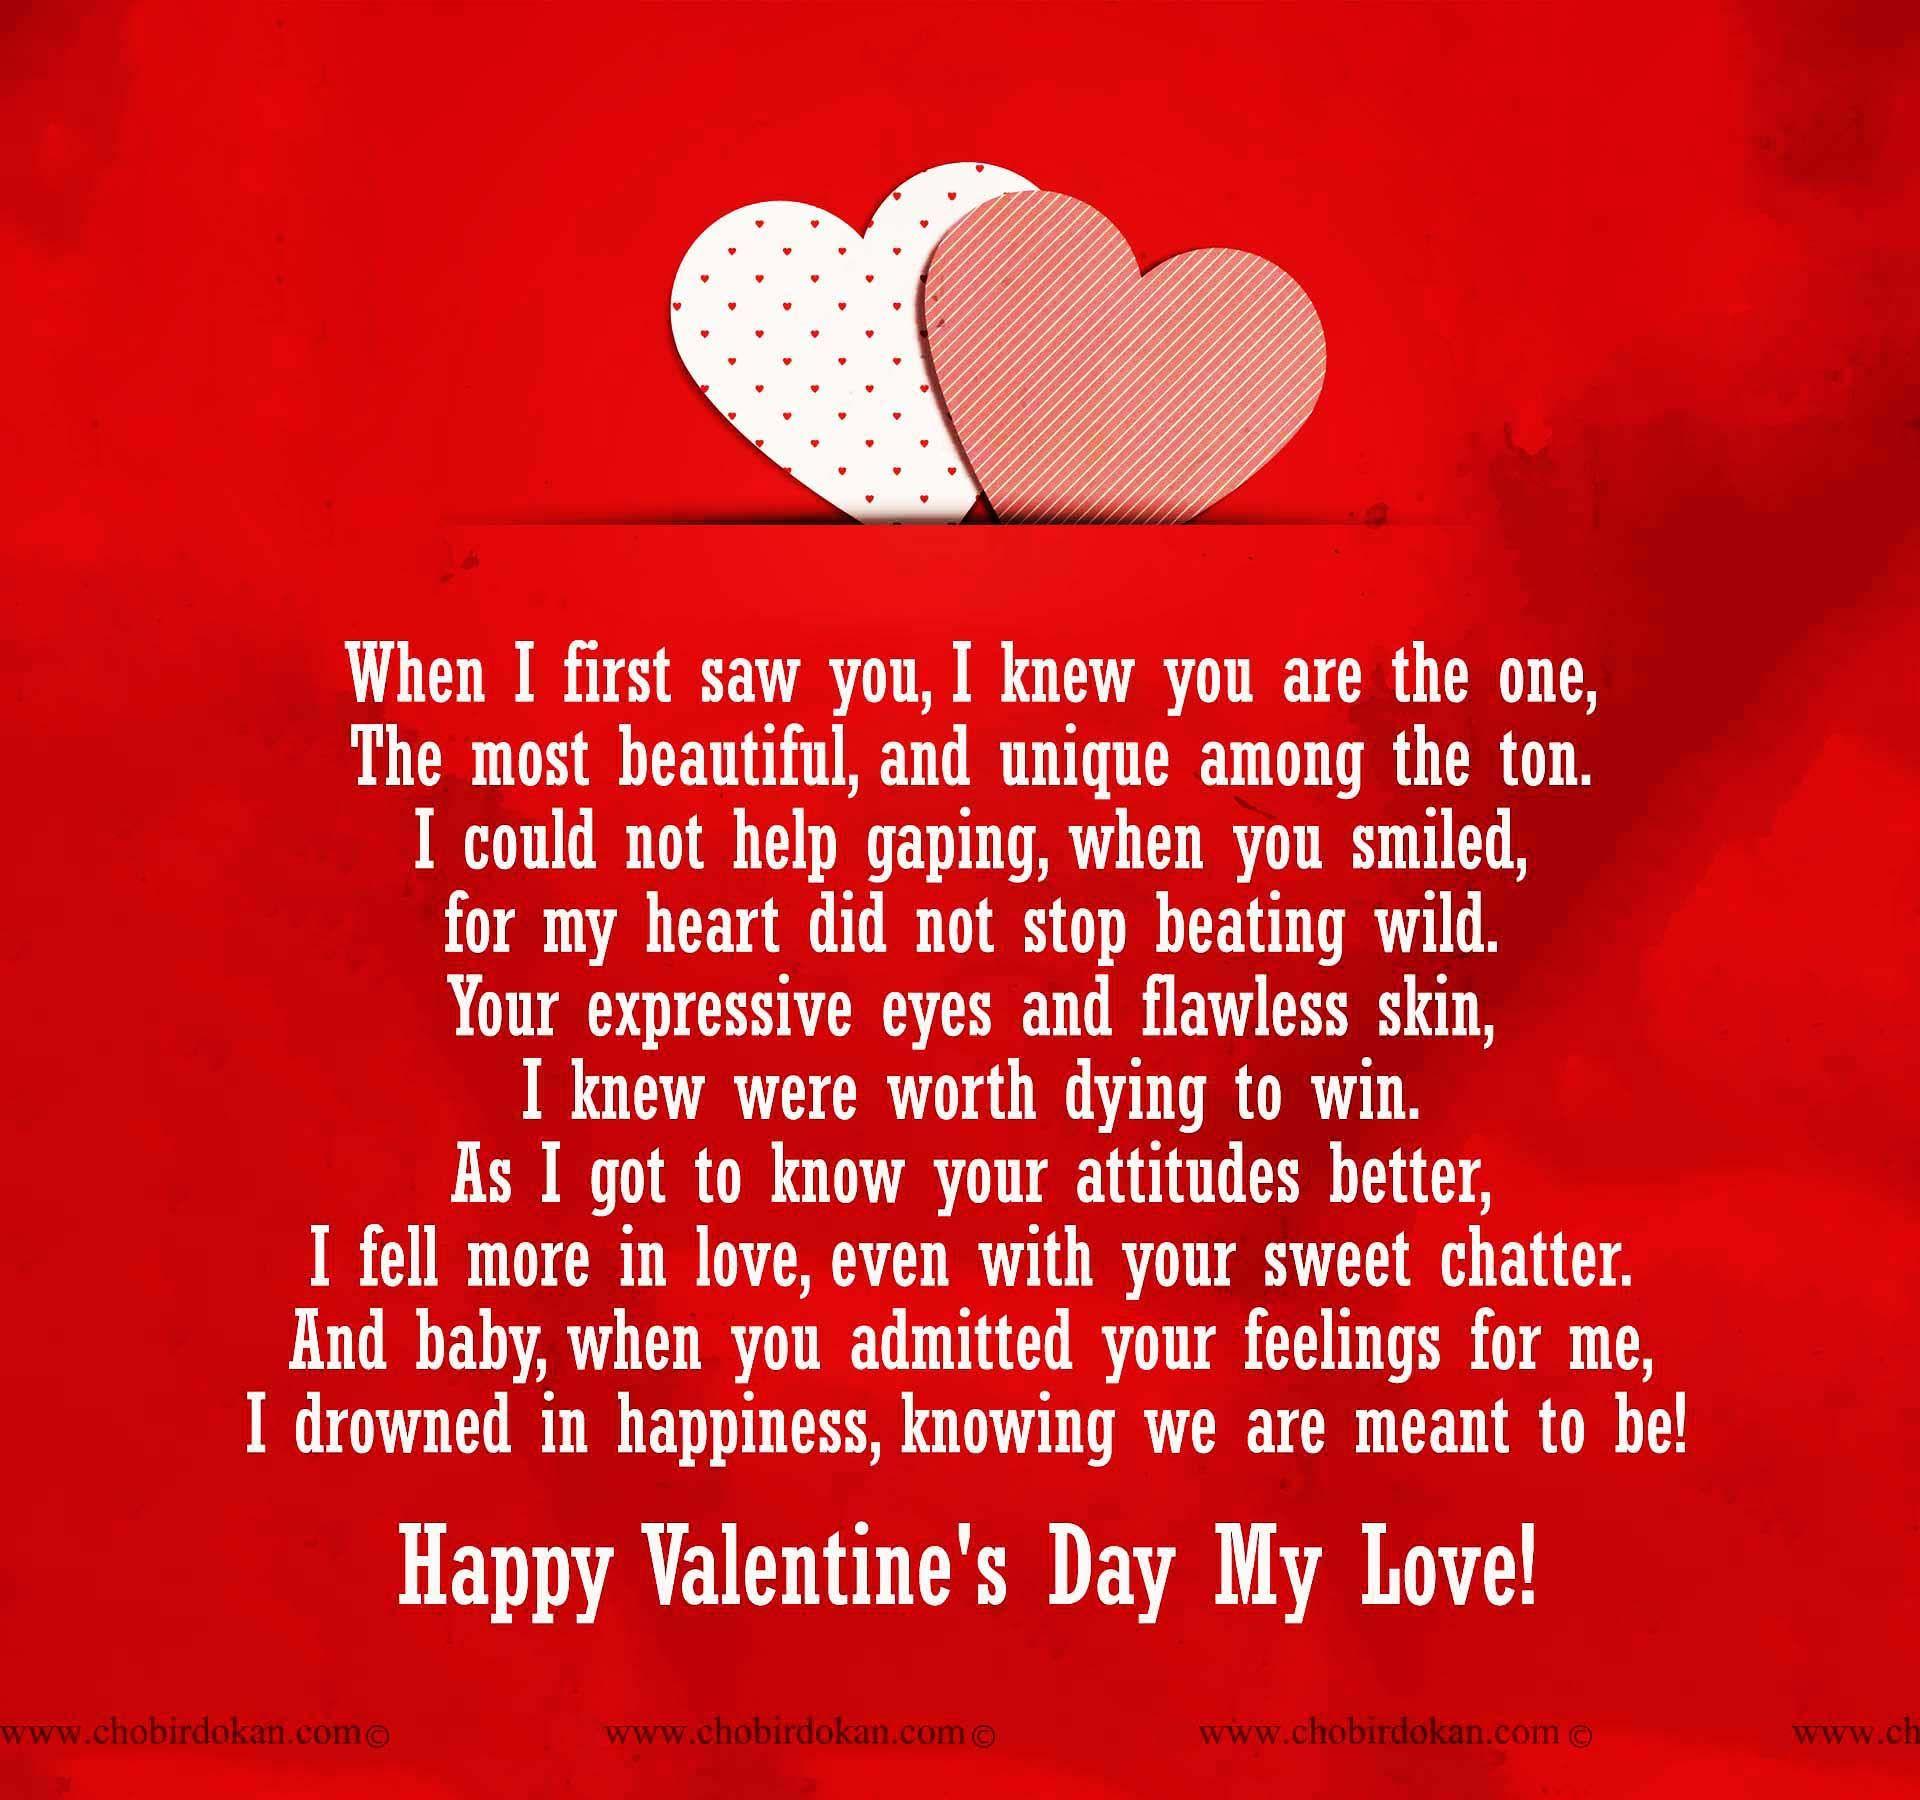 happy valentines day poems for herjpg 1920 - Valentines Day Poem For Him